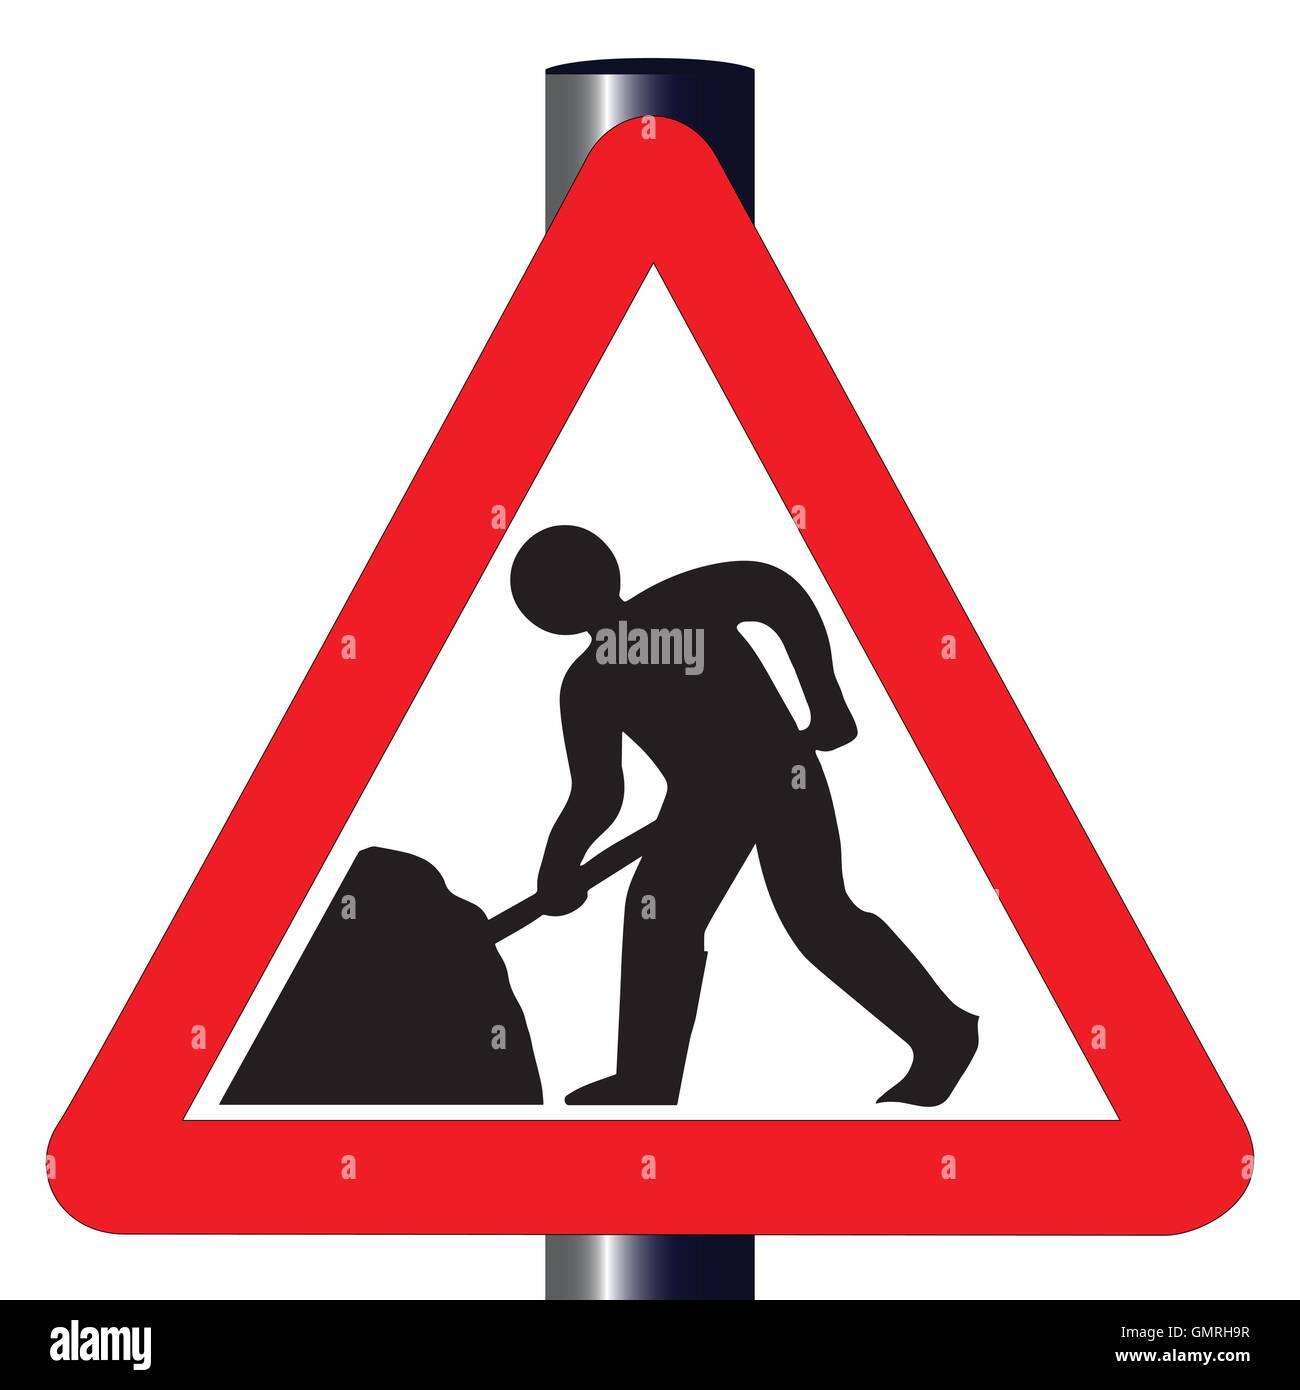 Roadworks Traffic Sign - Stock Vector